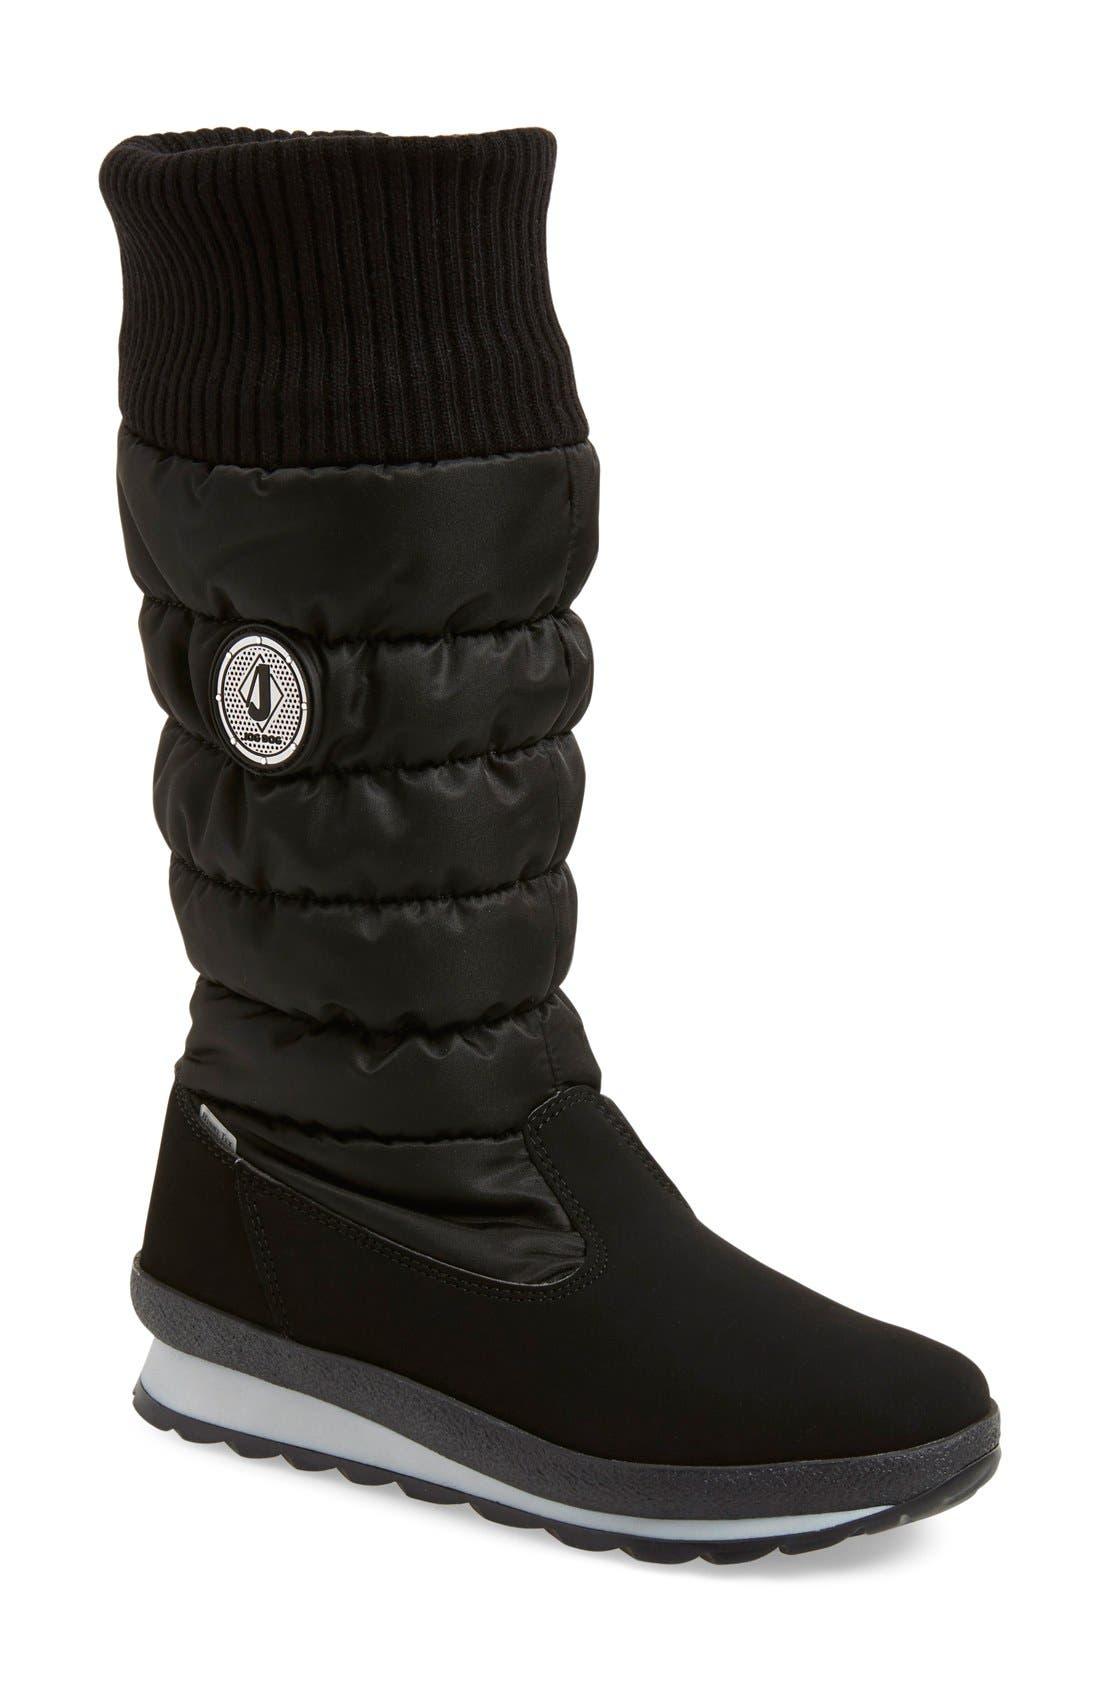 JOG DOG Waterproof Winter Boot (Women)